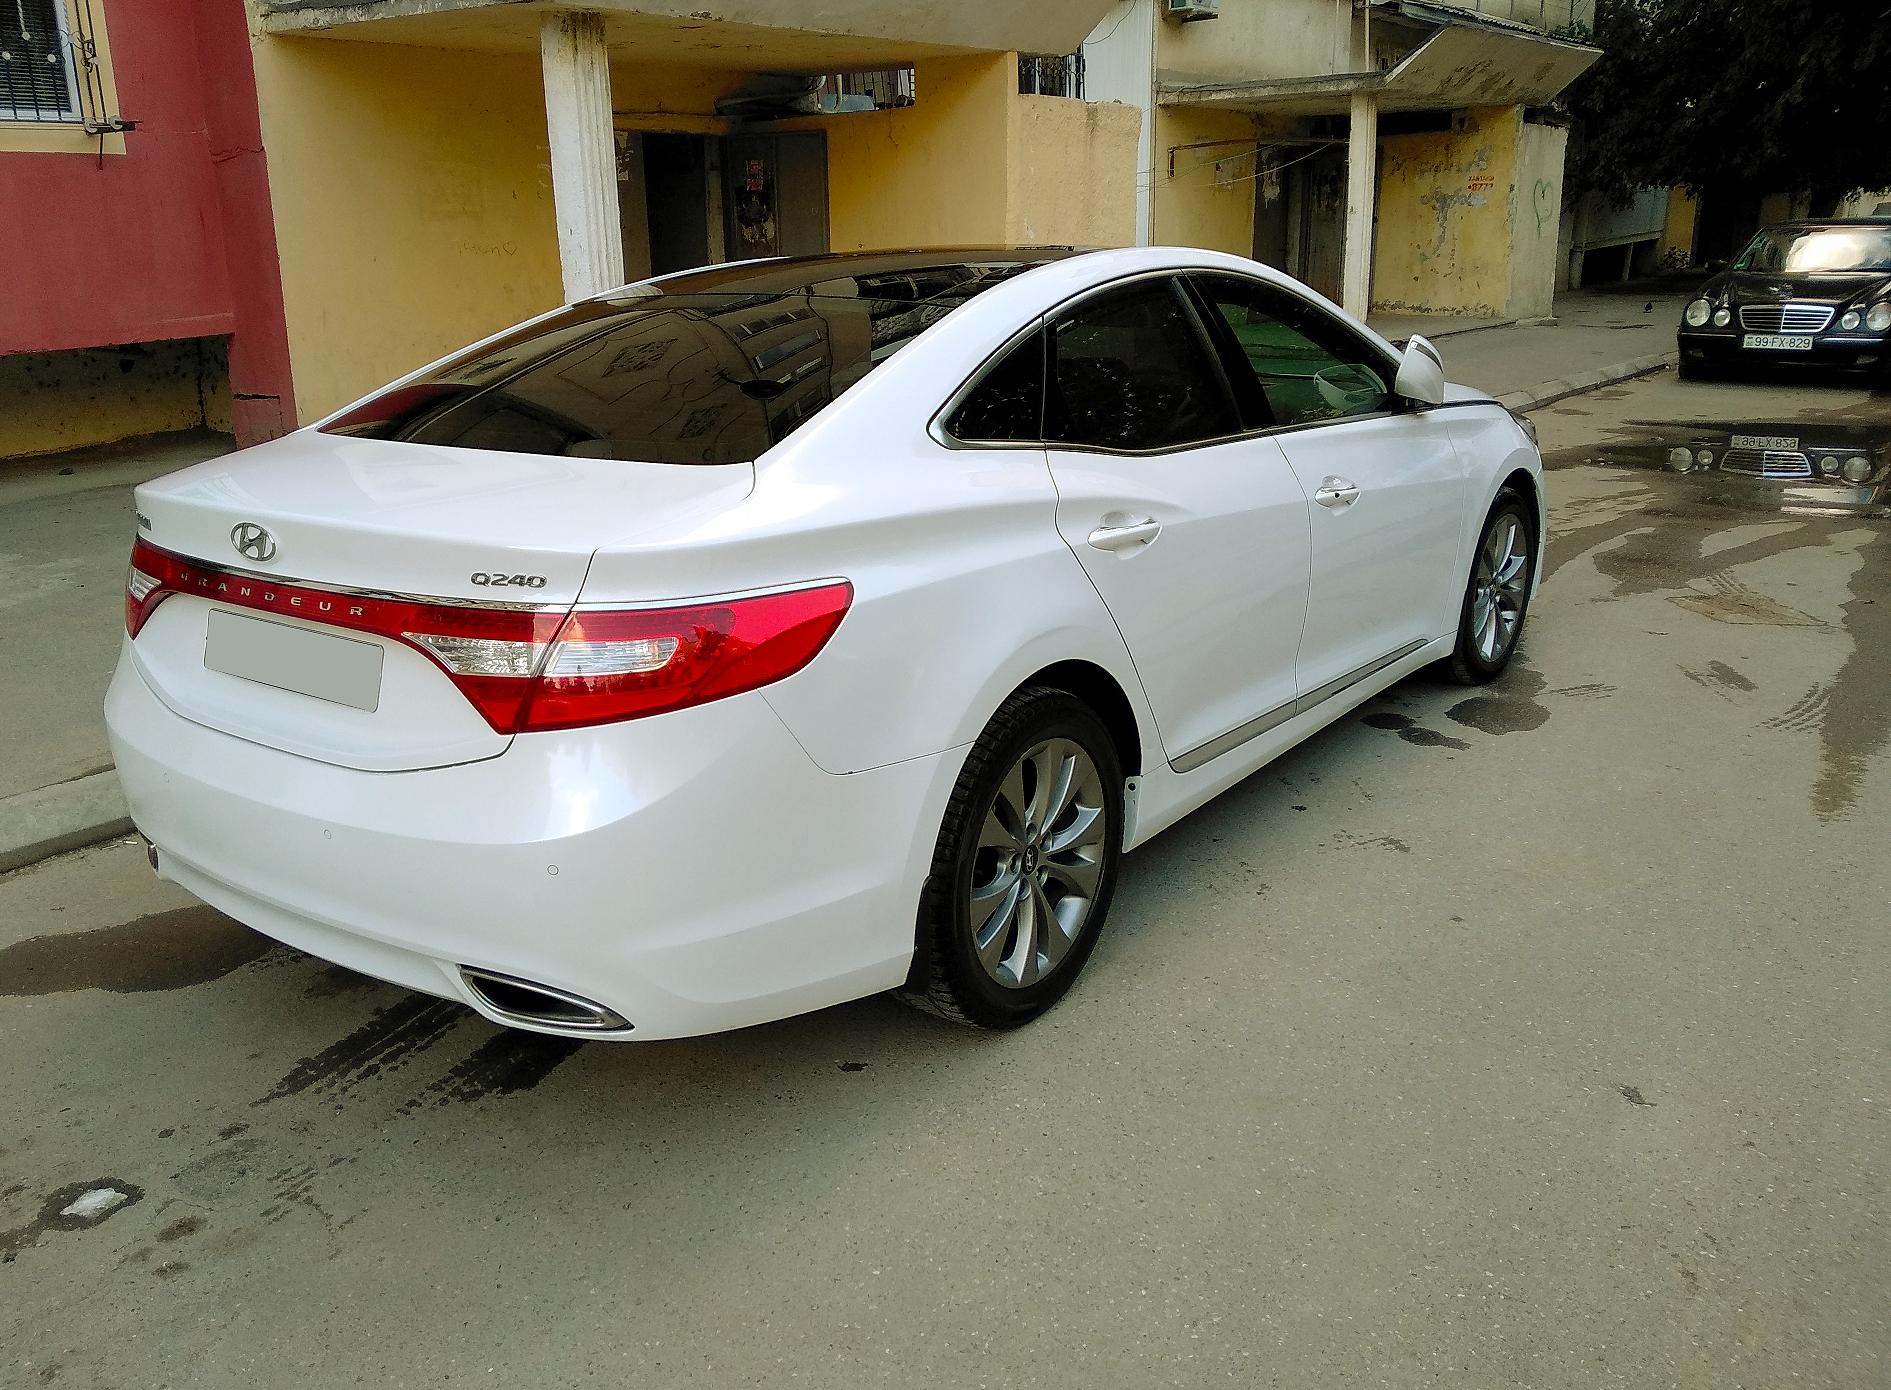 Hyundai Grandeur/Azera 2.4(lt) 2012 Подержанный  $17350